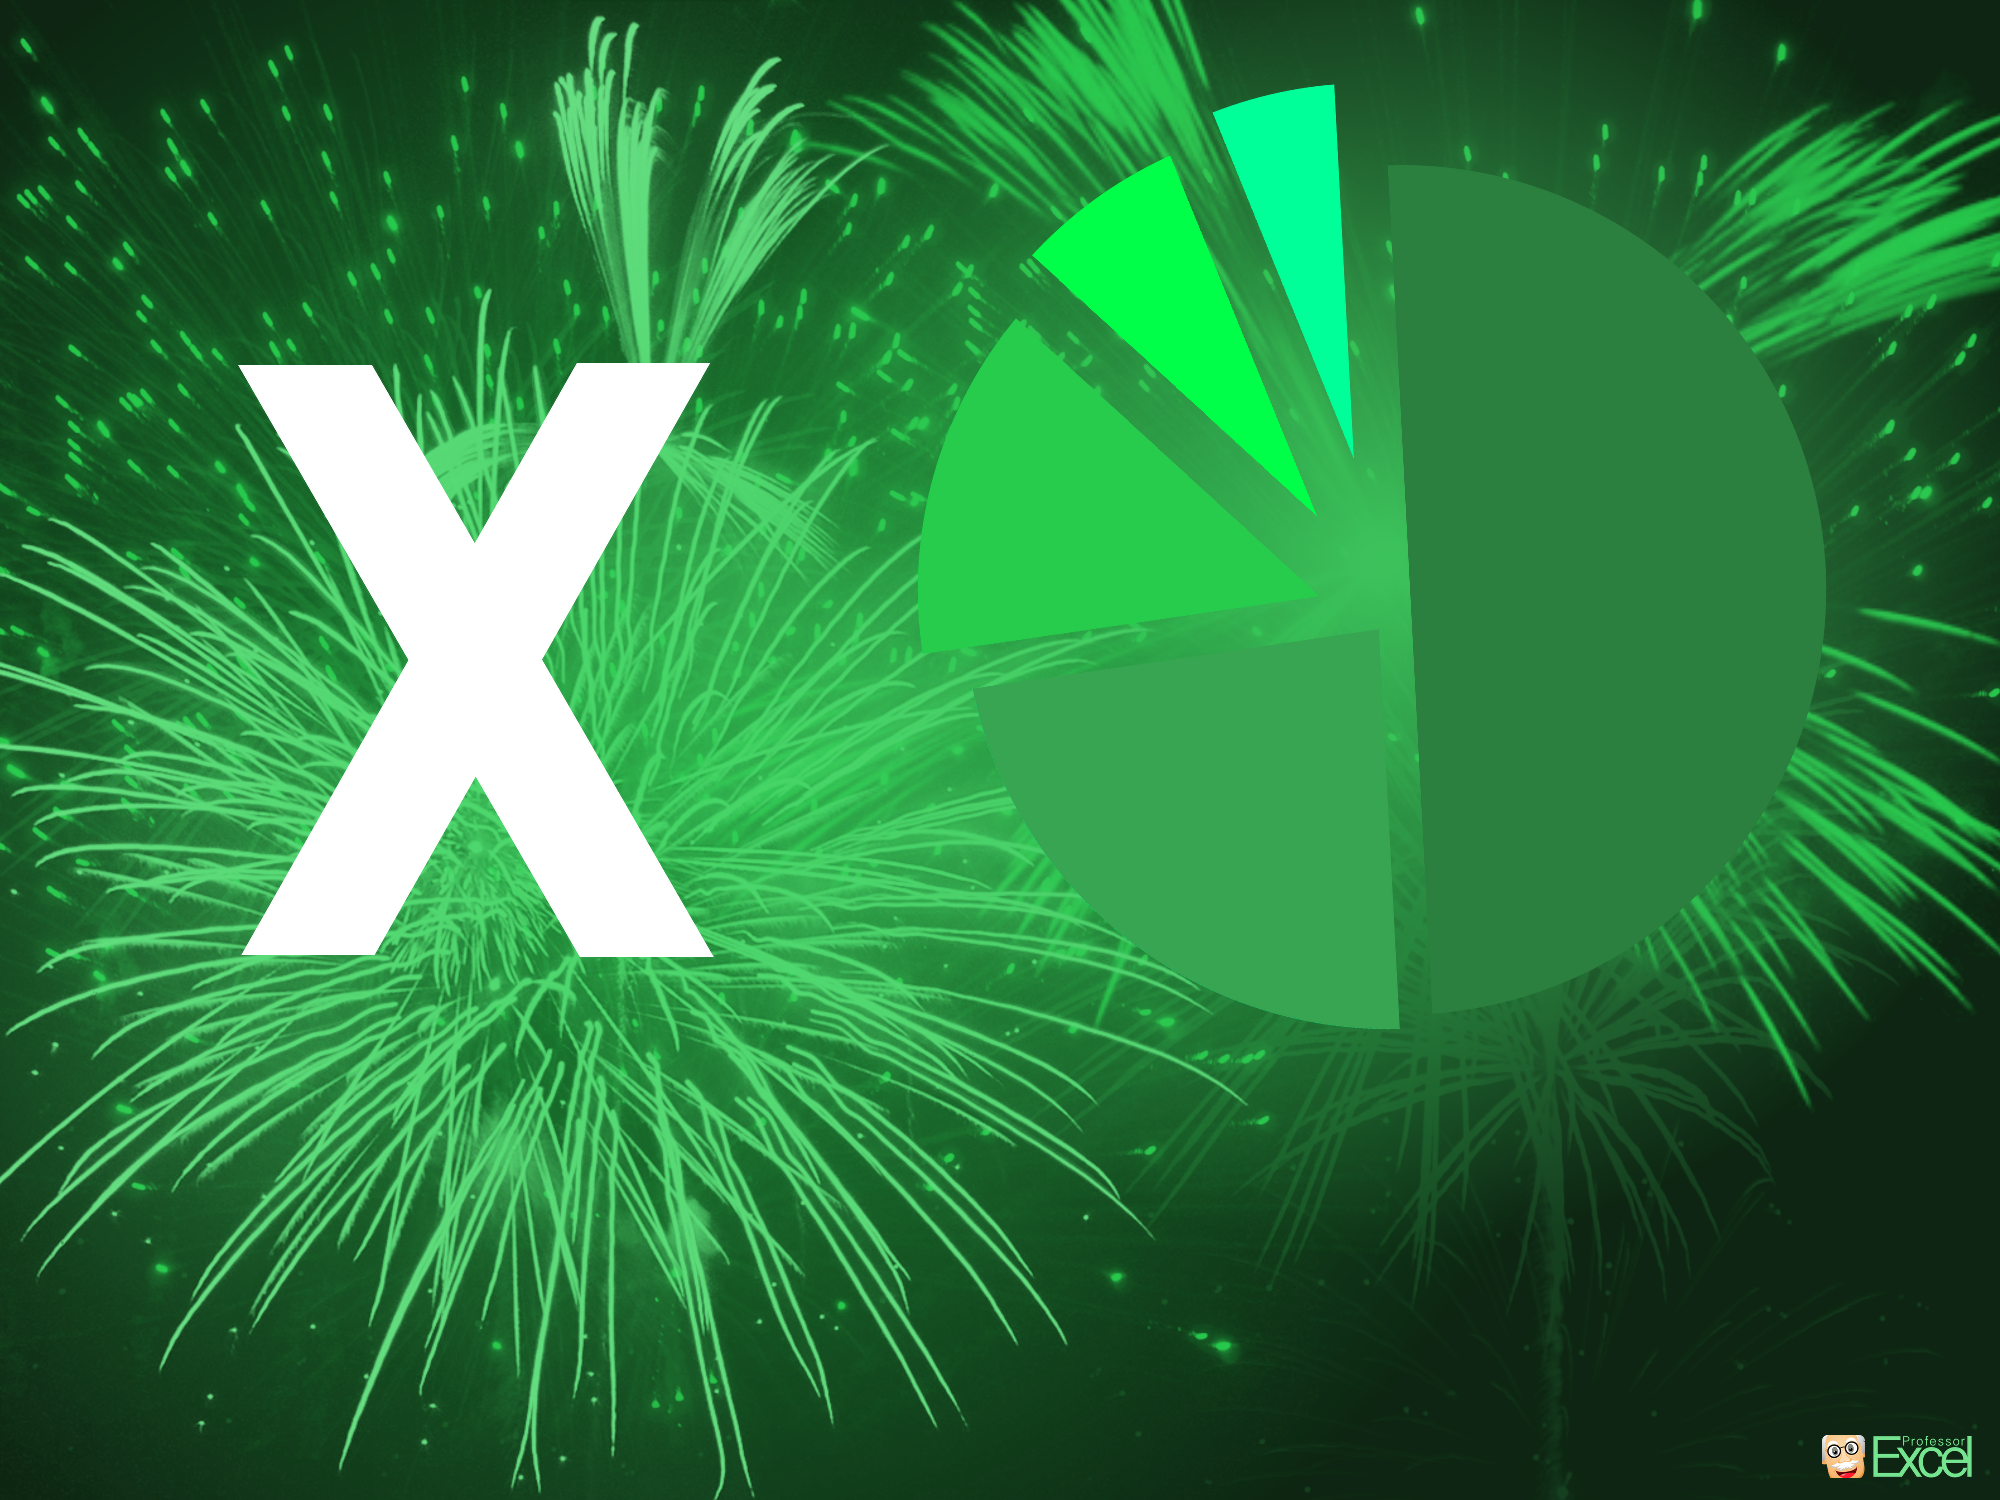 Background image in excel - Wallpaper Excel Graph Desktop Background Green